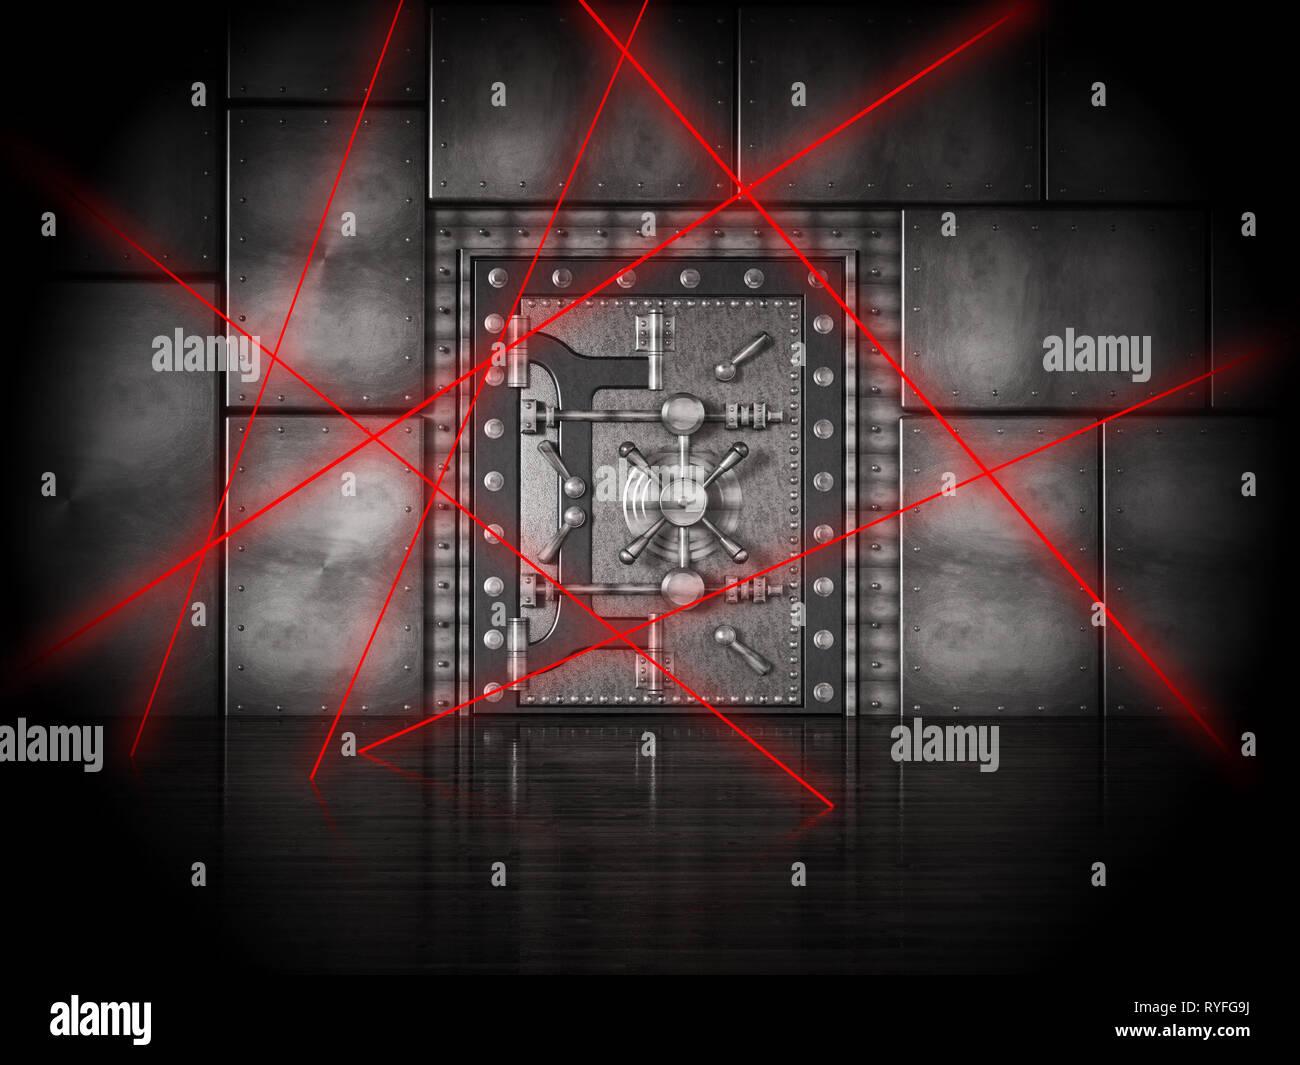 Red laser beams on bank vault door under heavy protection. 3D illustration. - Stock Image